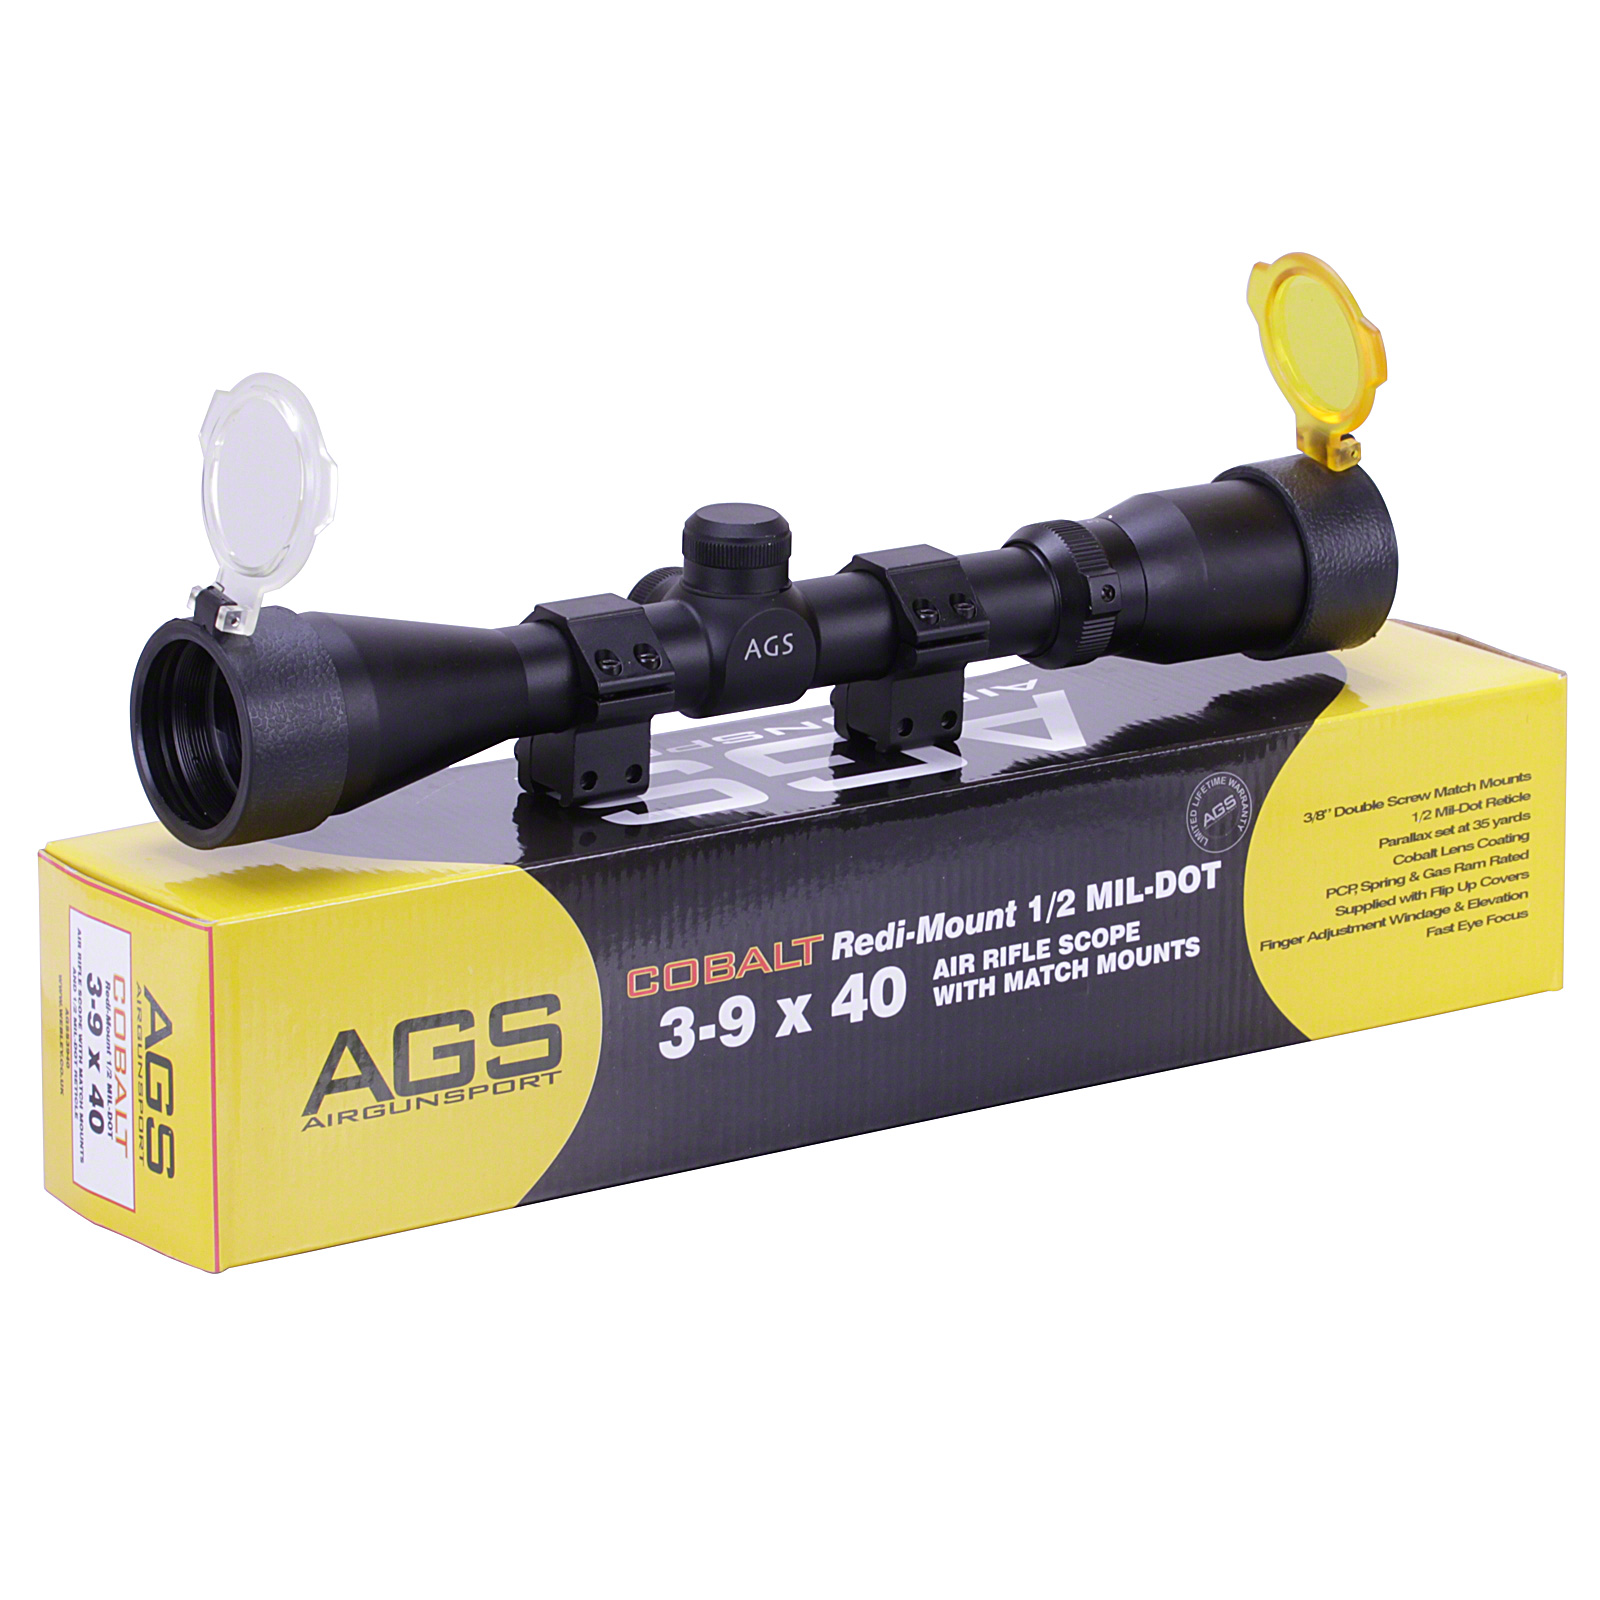 Tactical 3-9x40 Mil Dot Zoom Sniper Air Rifle Gun Airgun Hunting Scope Sight